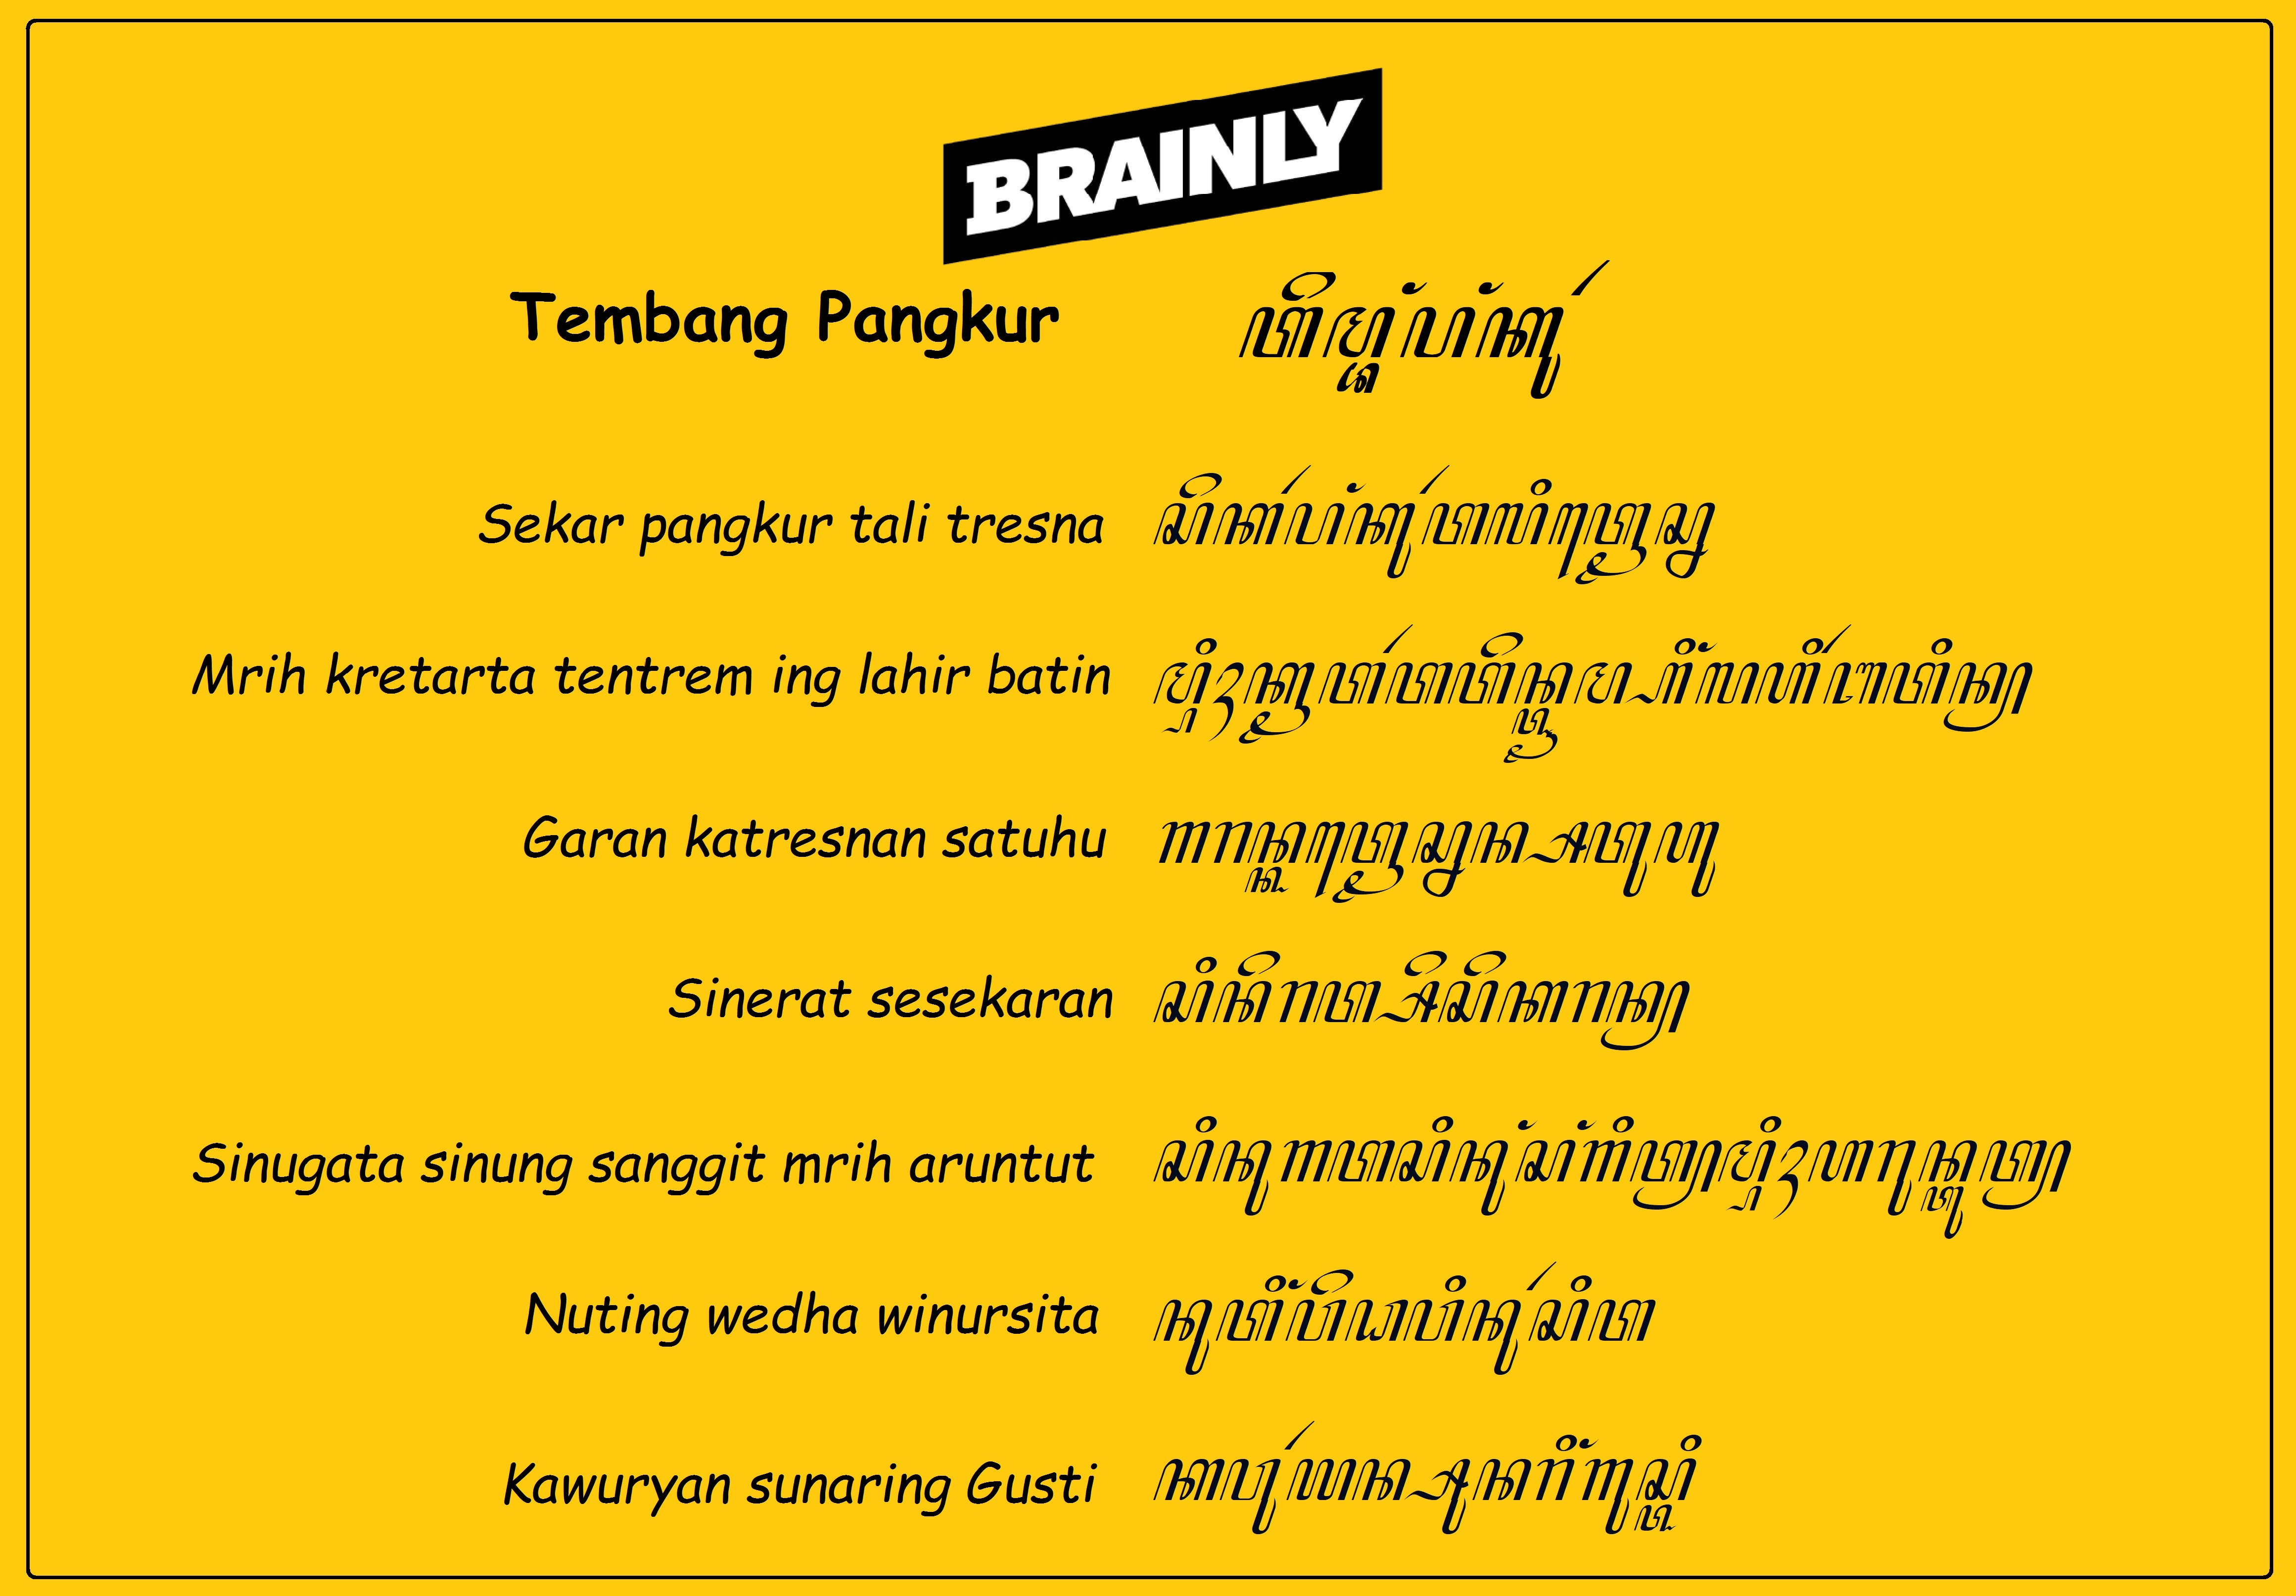 Tuliskan Dalam Aksara Jawa Tembang Pangkur Brainly Co Id